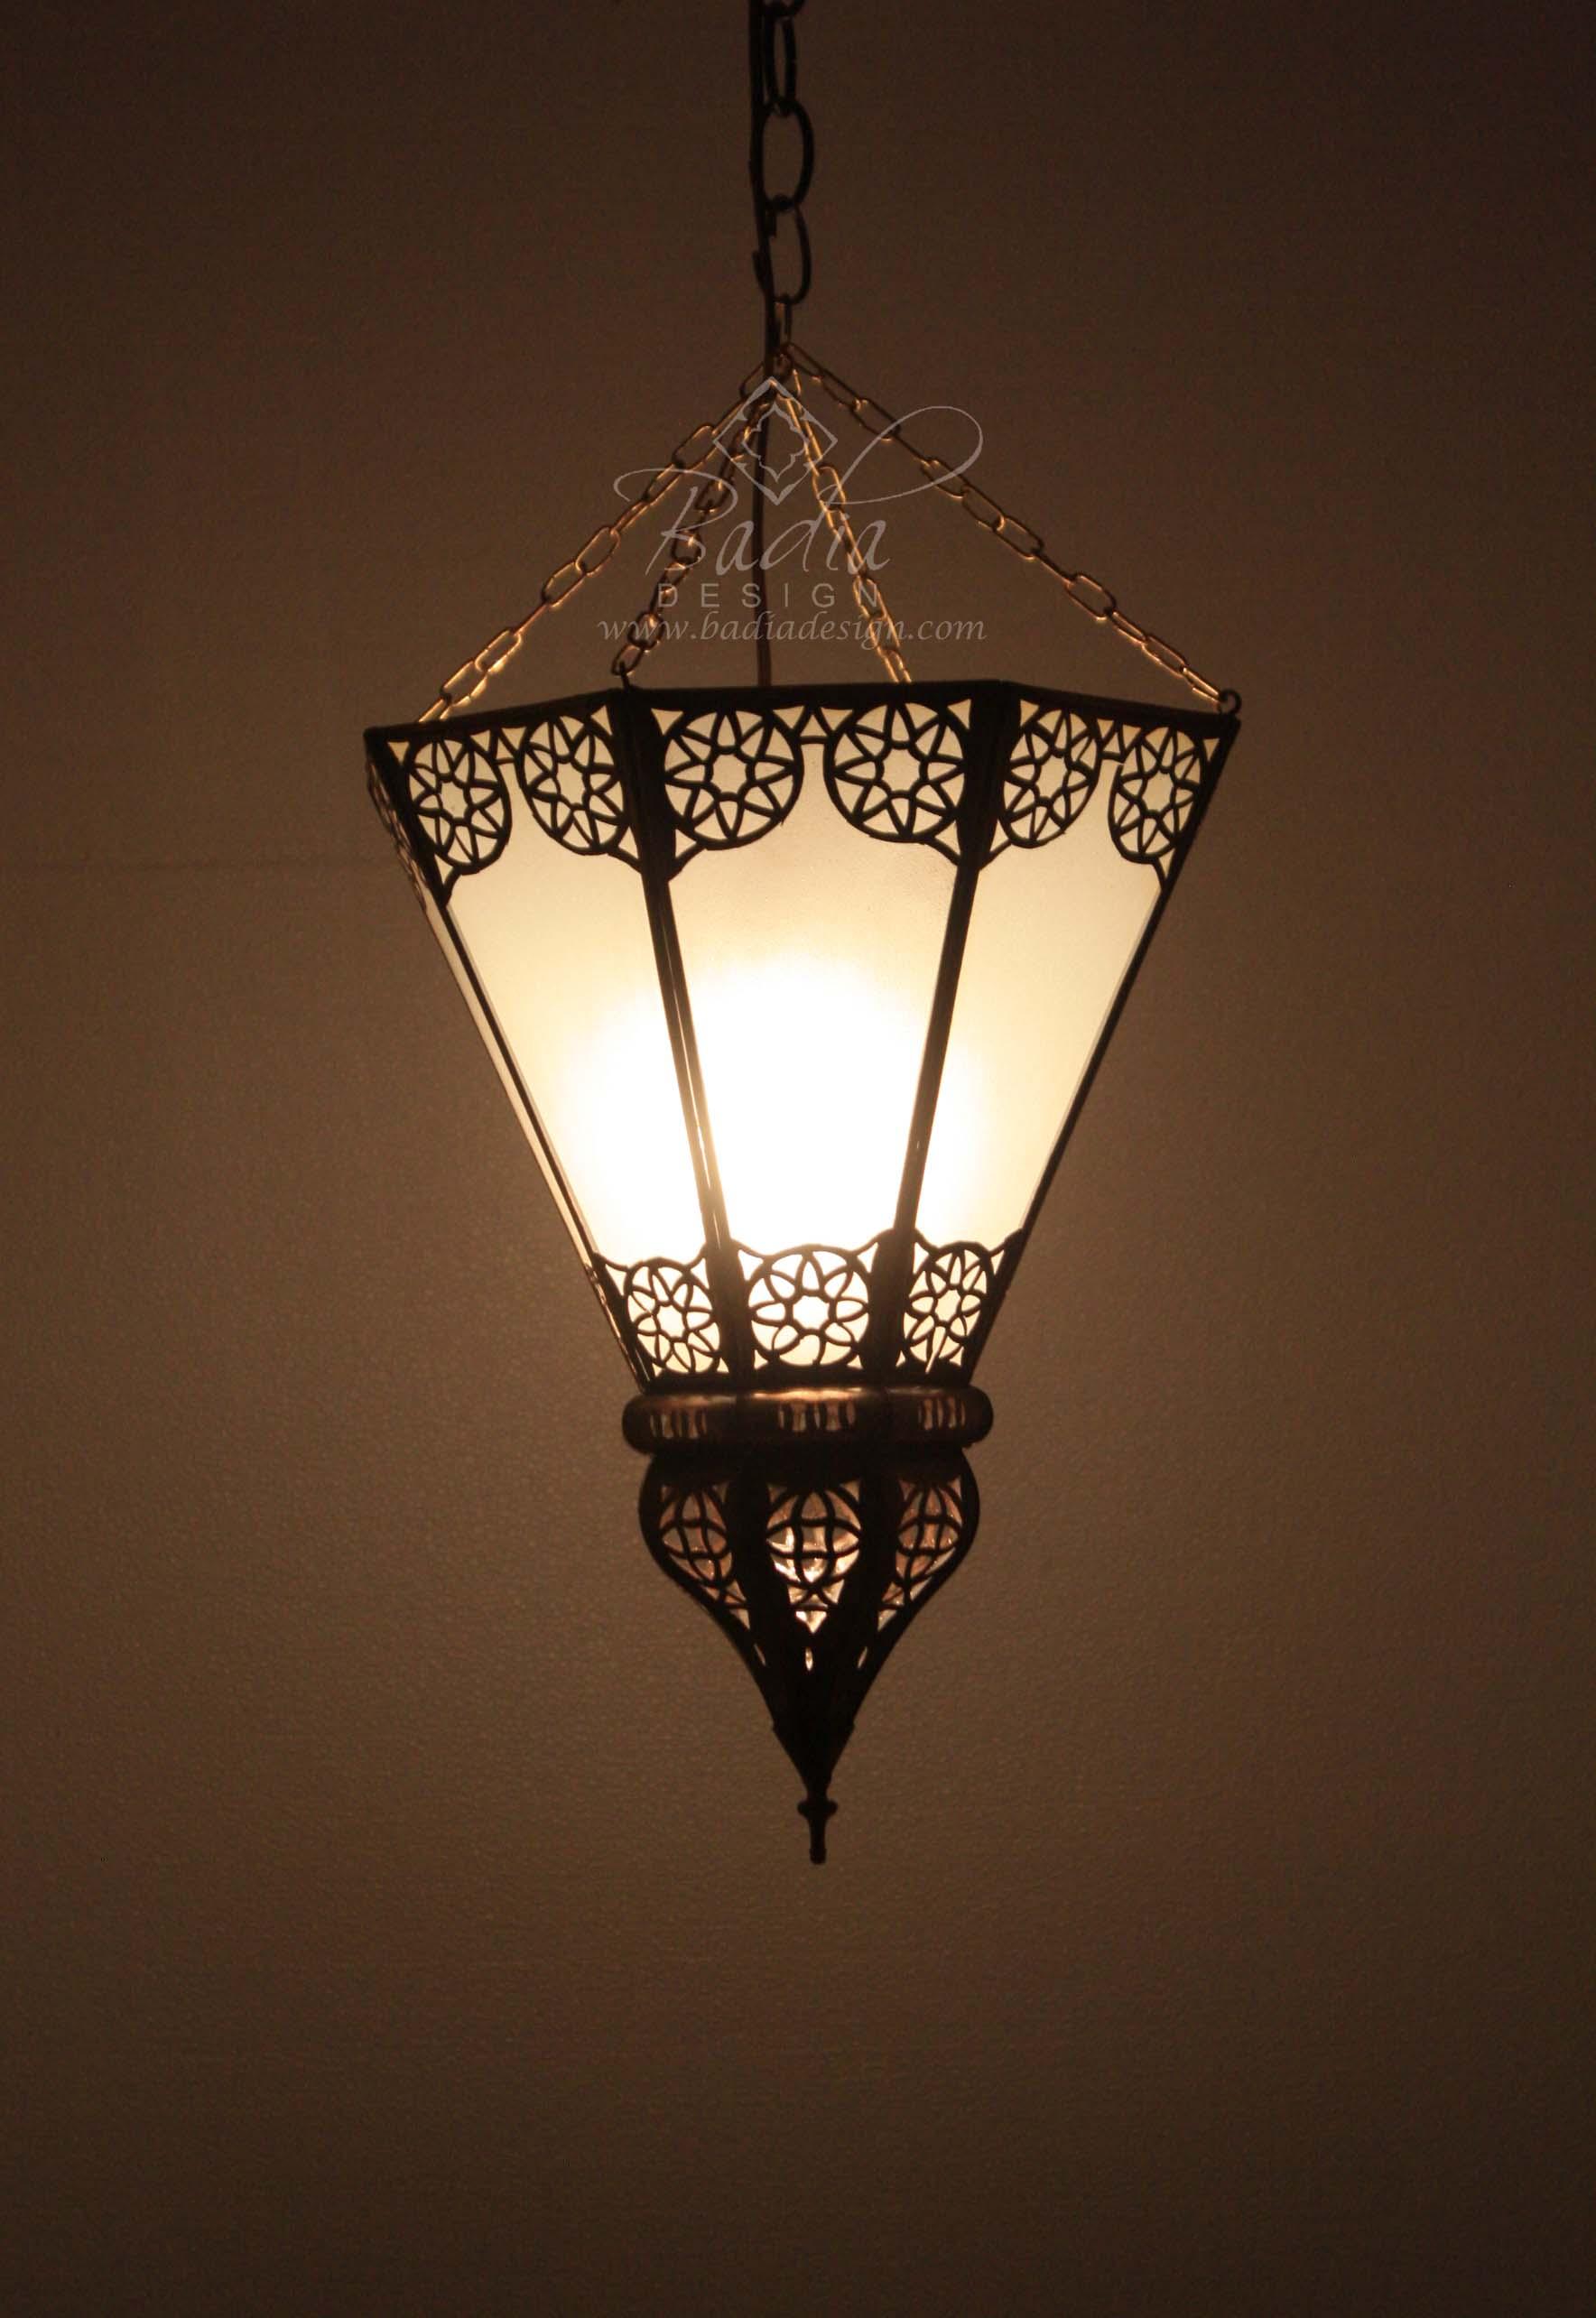 moroccan-hanging-lantern-with-white-glass-lig383-3.jpg